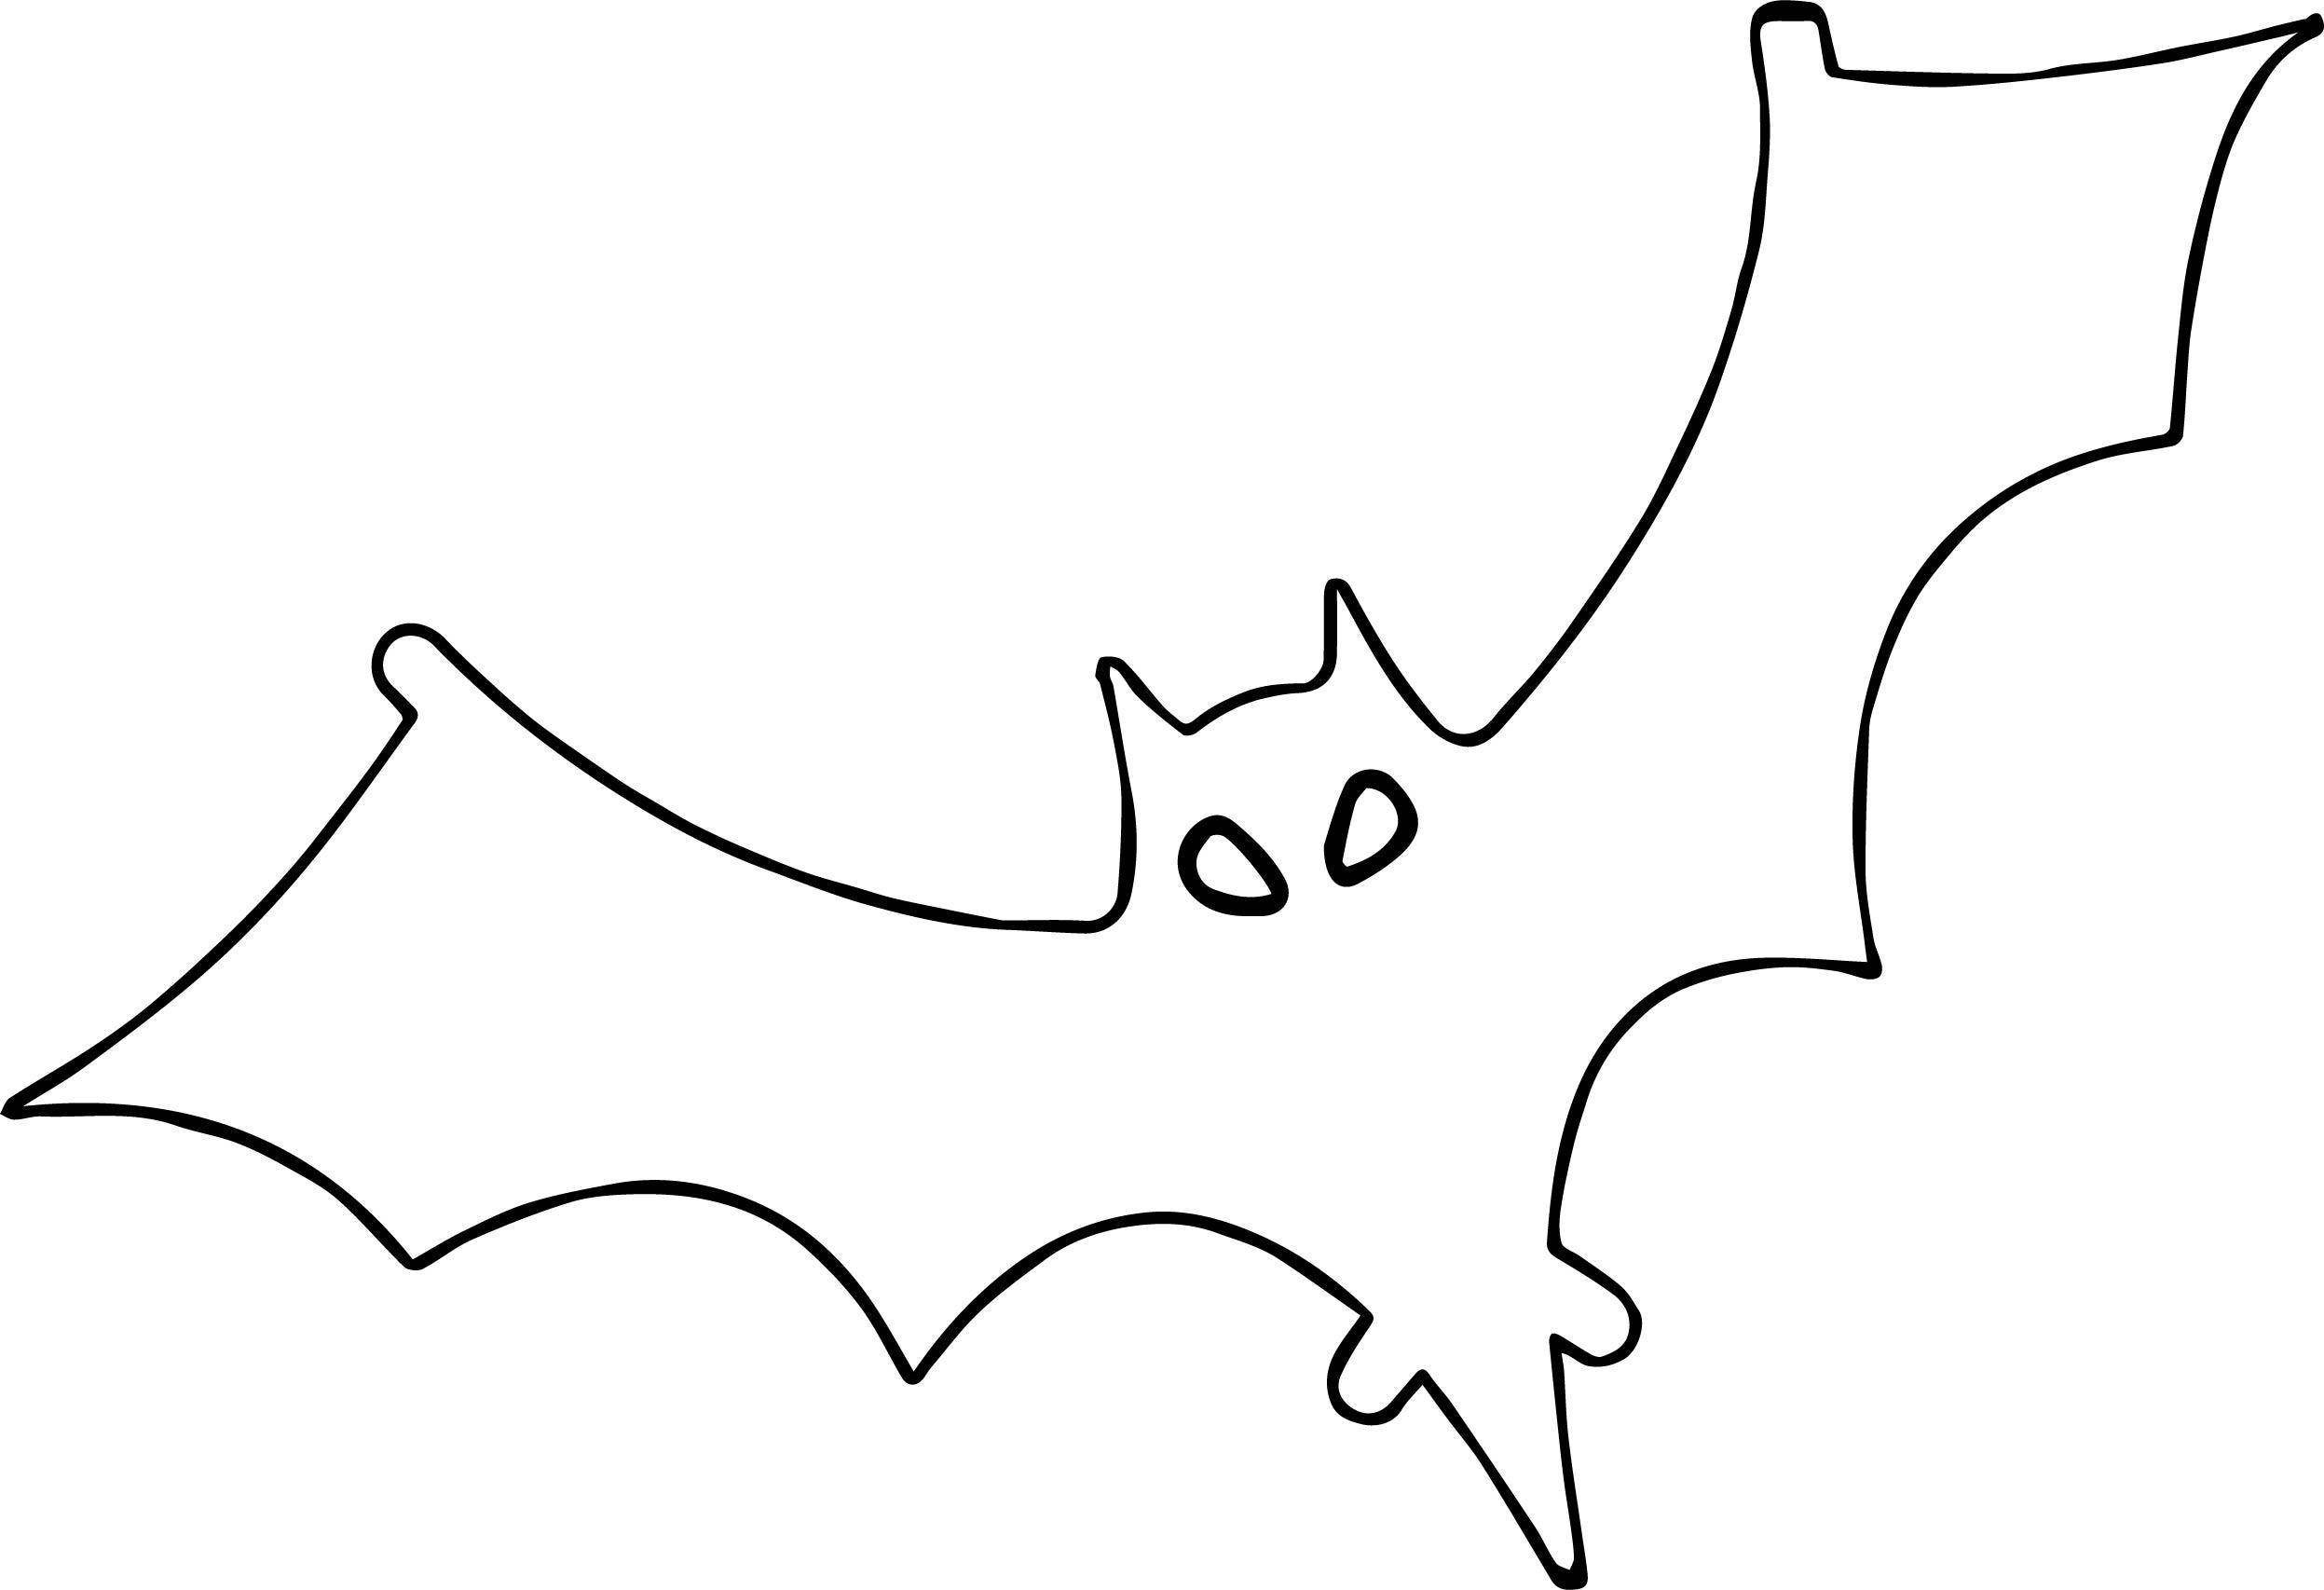 Outline Bat Coloring Page